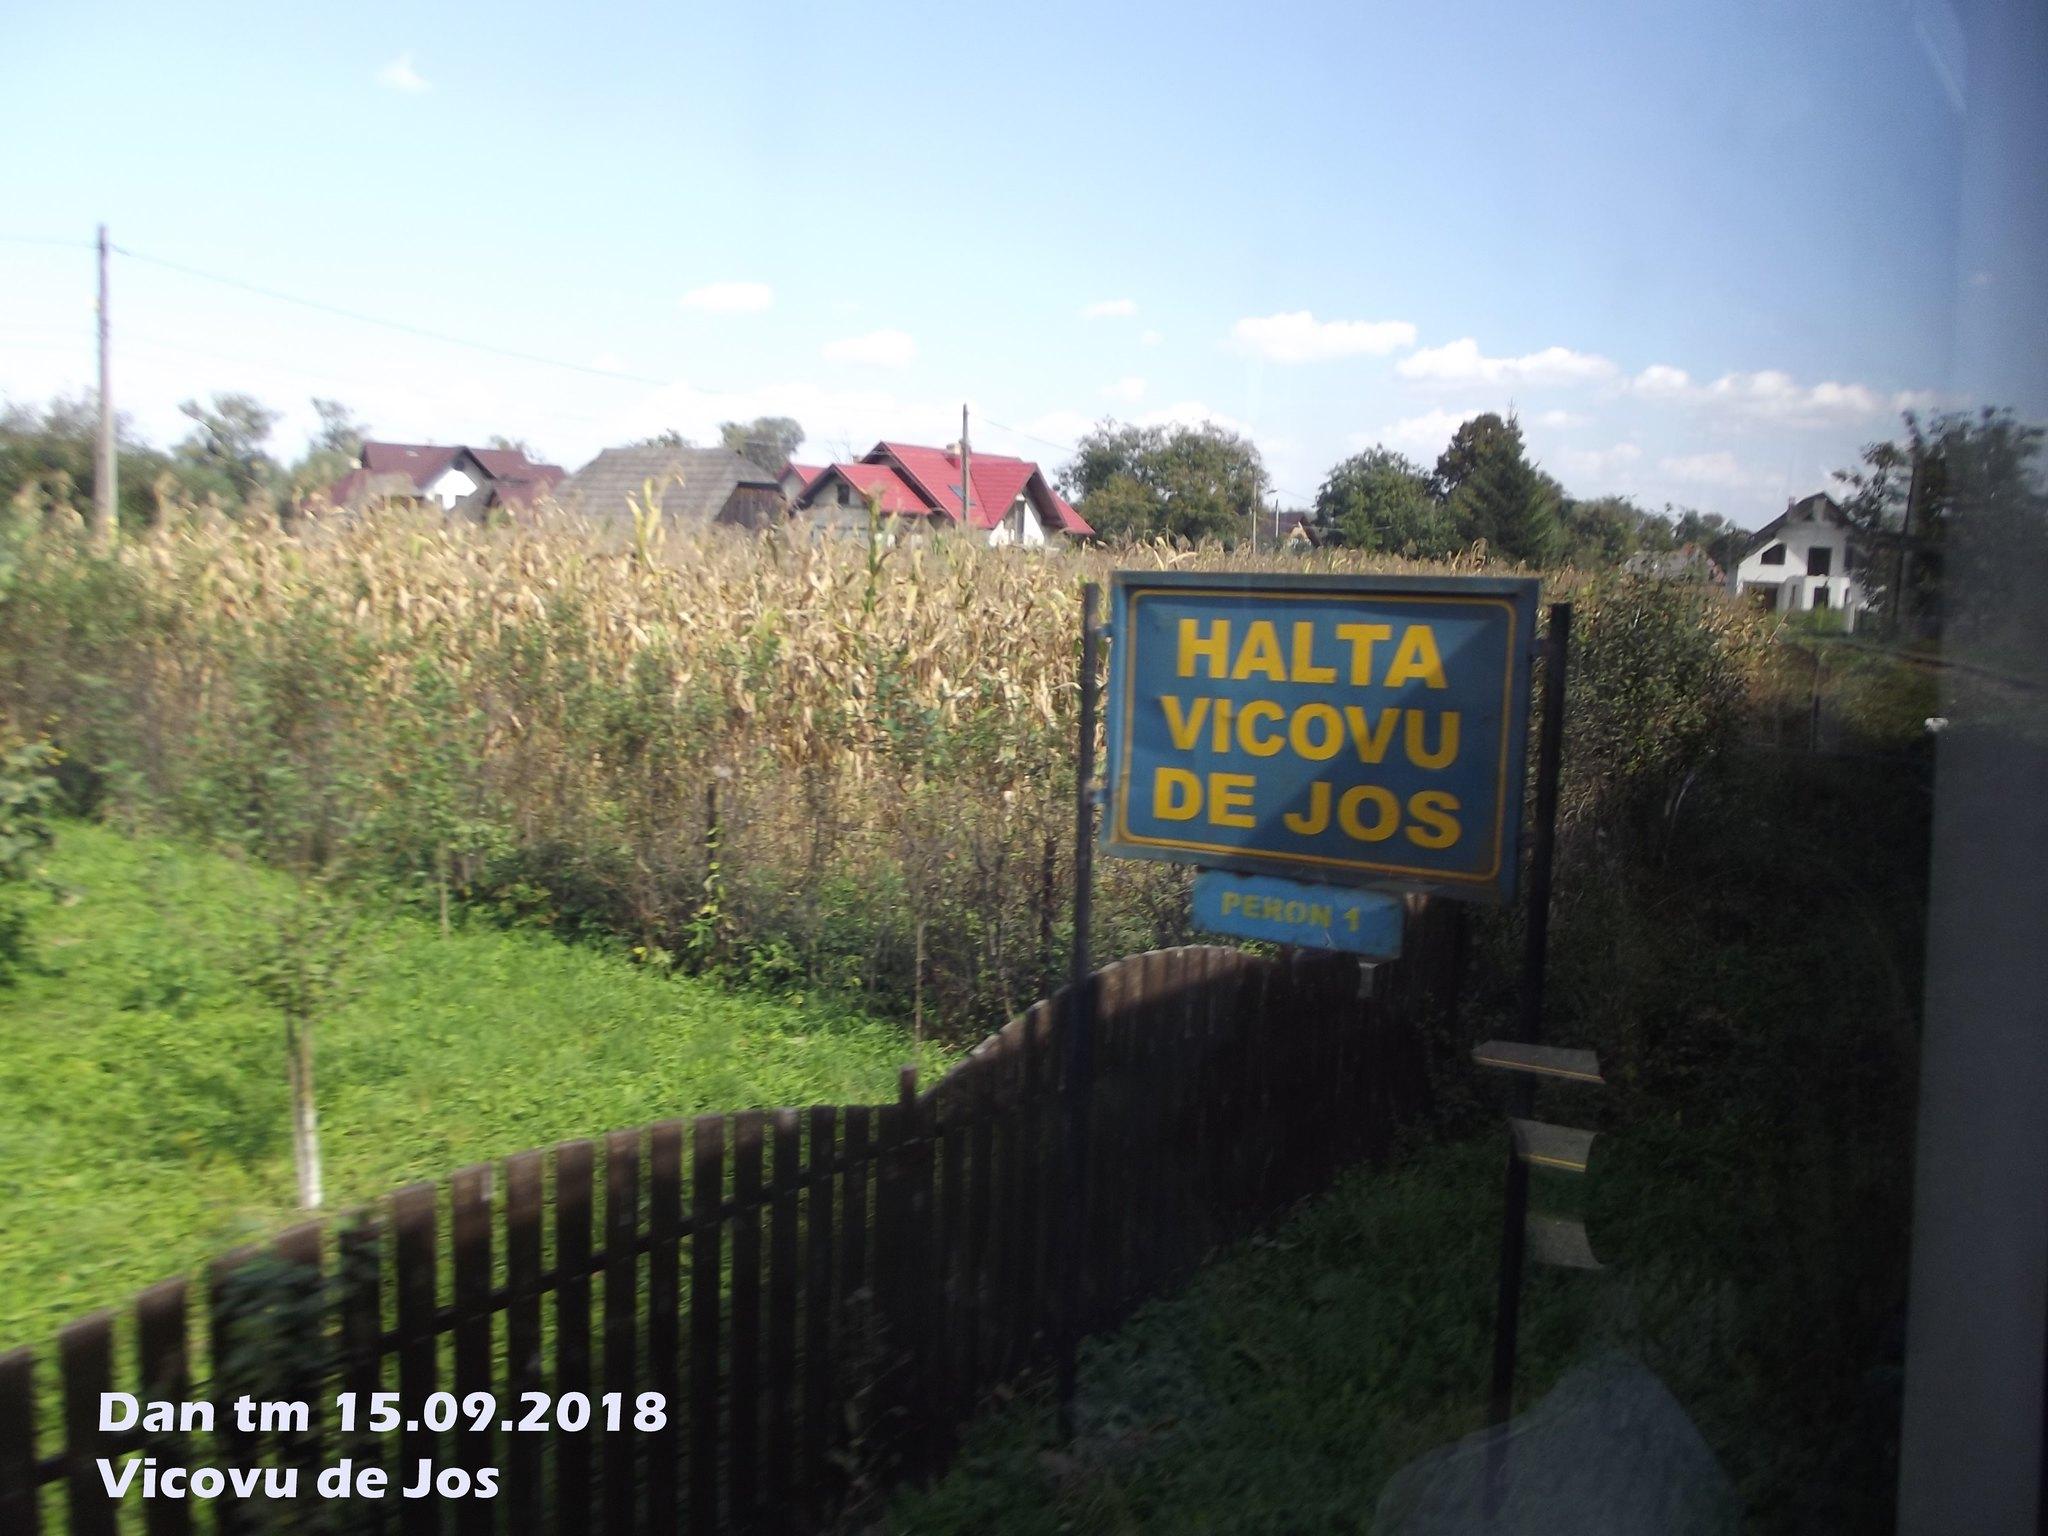 515 : Dorneşti - Gura Putnei - (Putna) - Nisipitu - Seletin UKR - Pagina 47 44016736324_879b9c3a31_k